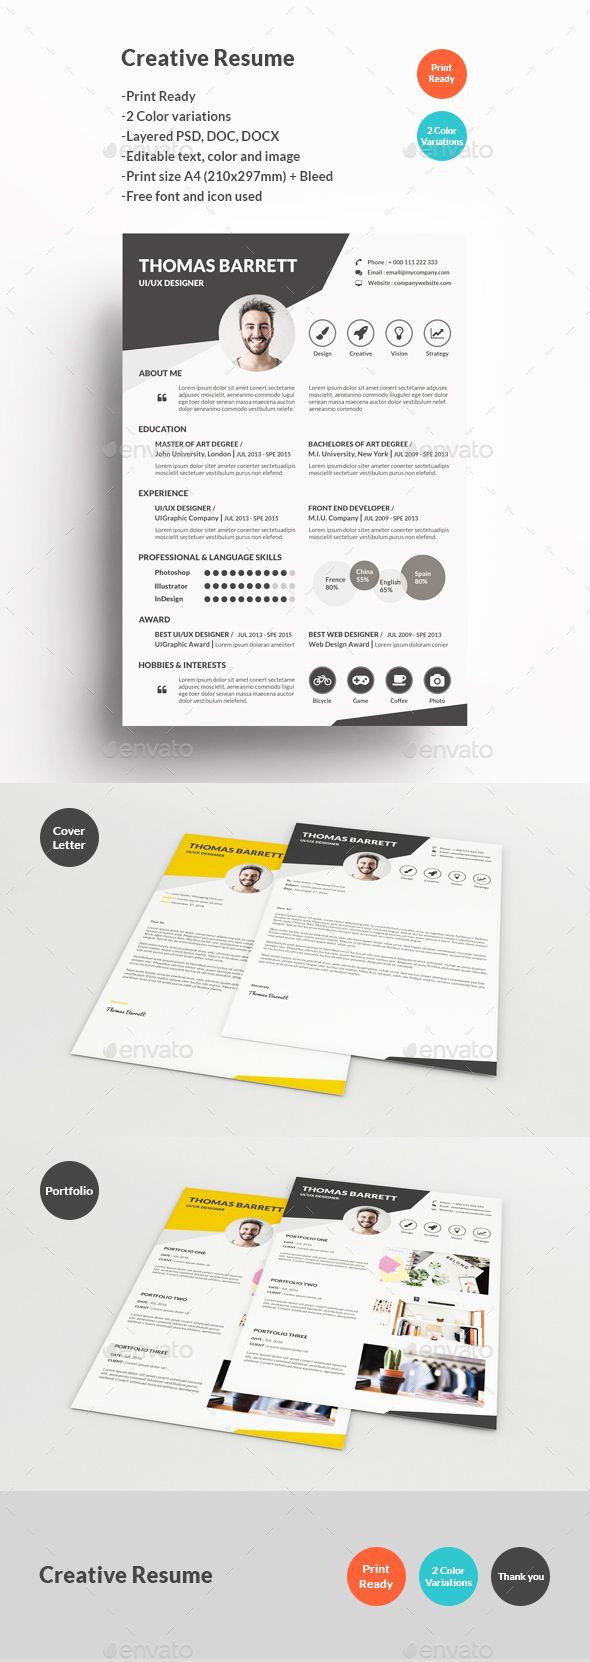 Editable infographic resume template